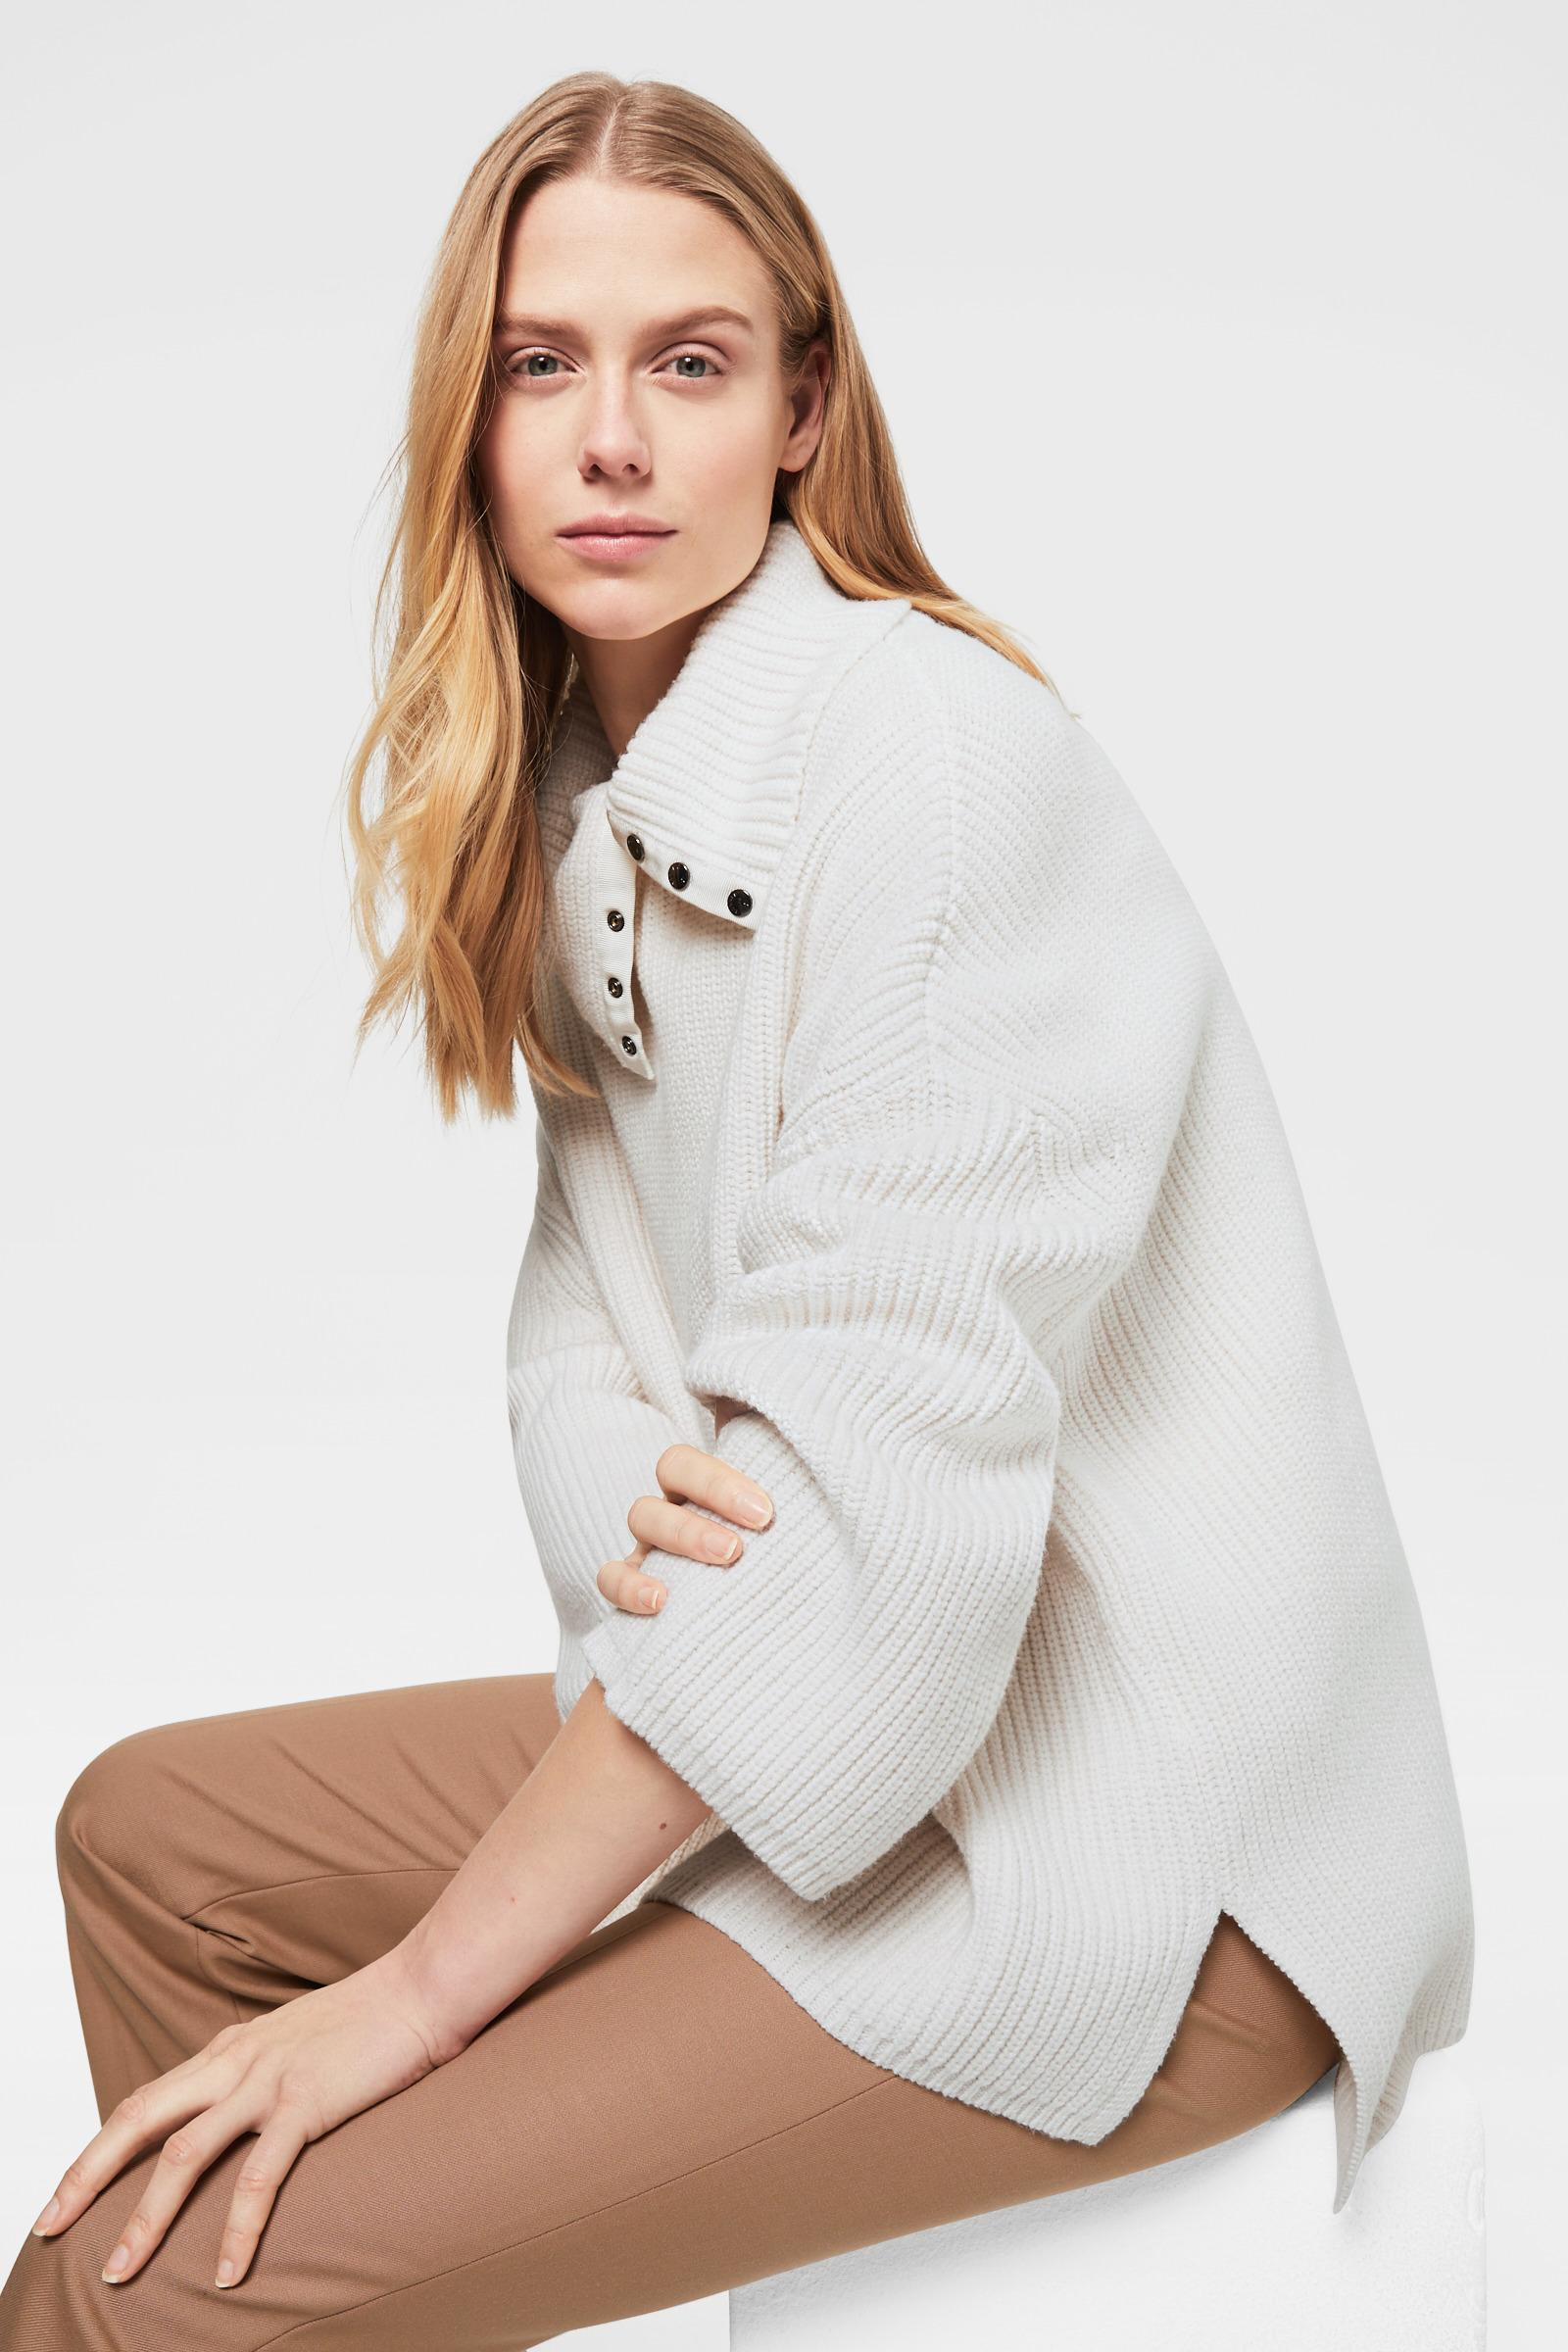 Insun Womens Fashion Faux Fur Collar Knit Batwing Sleeve Cardigan Poncho Cape